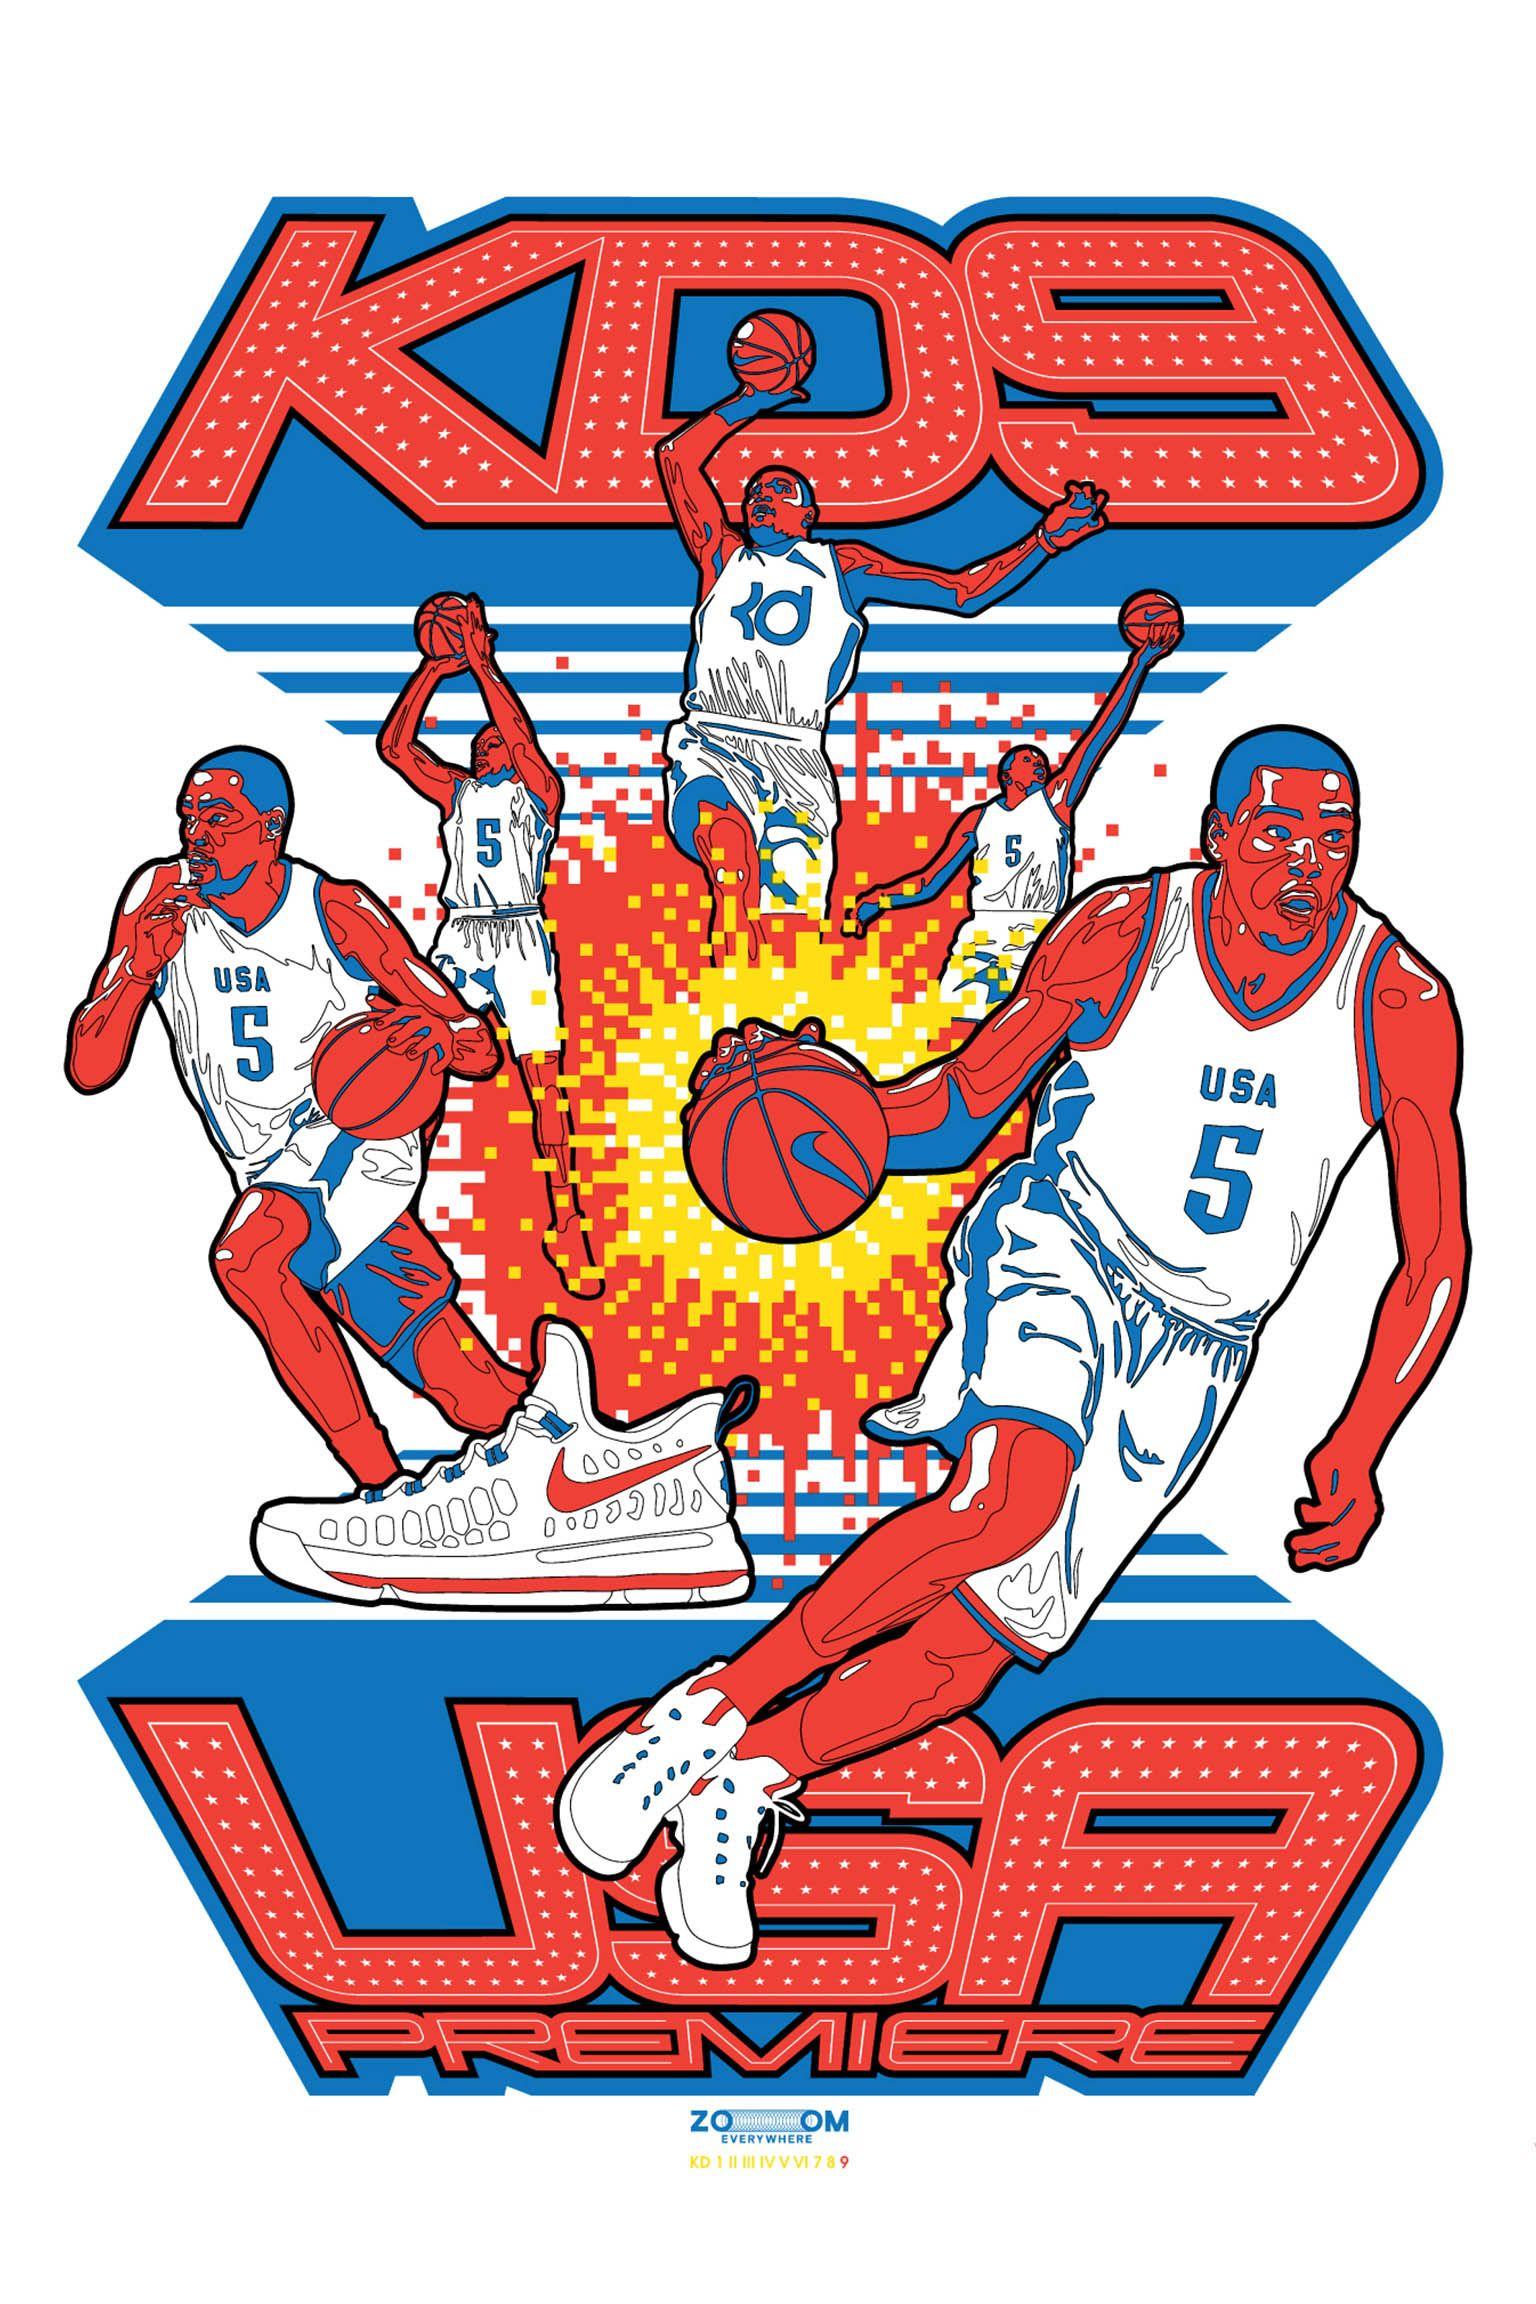 Art of Sneakers: Nike KD-signaturserien